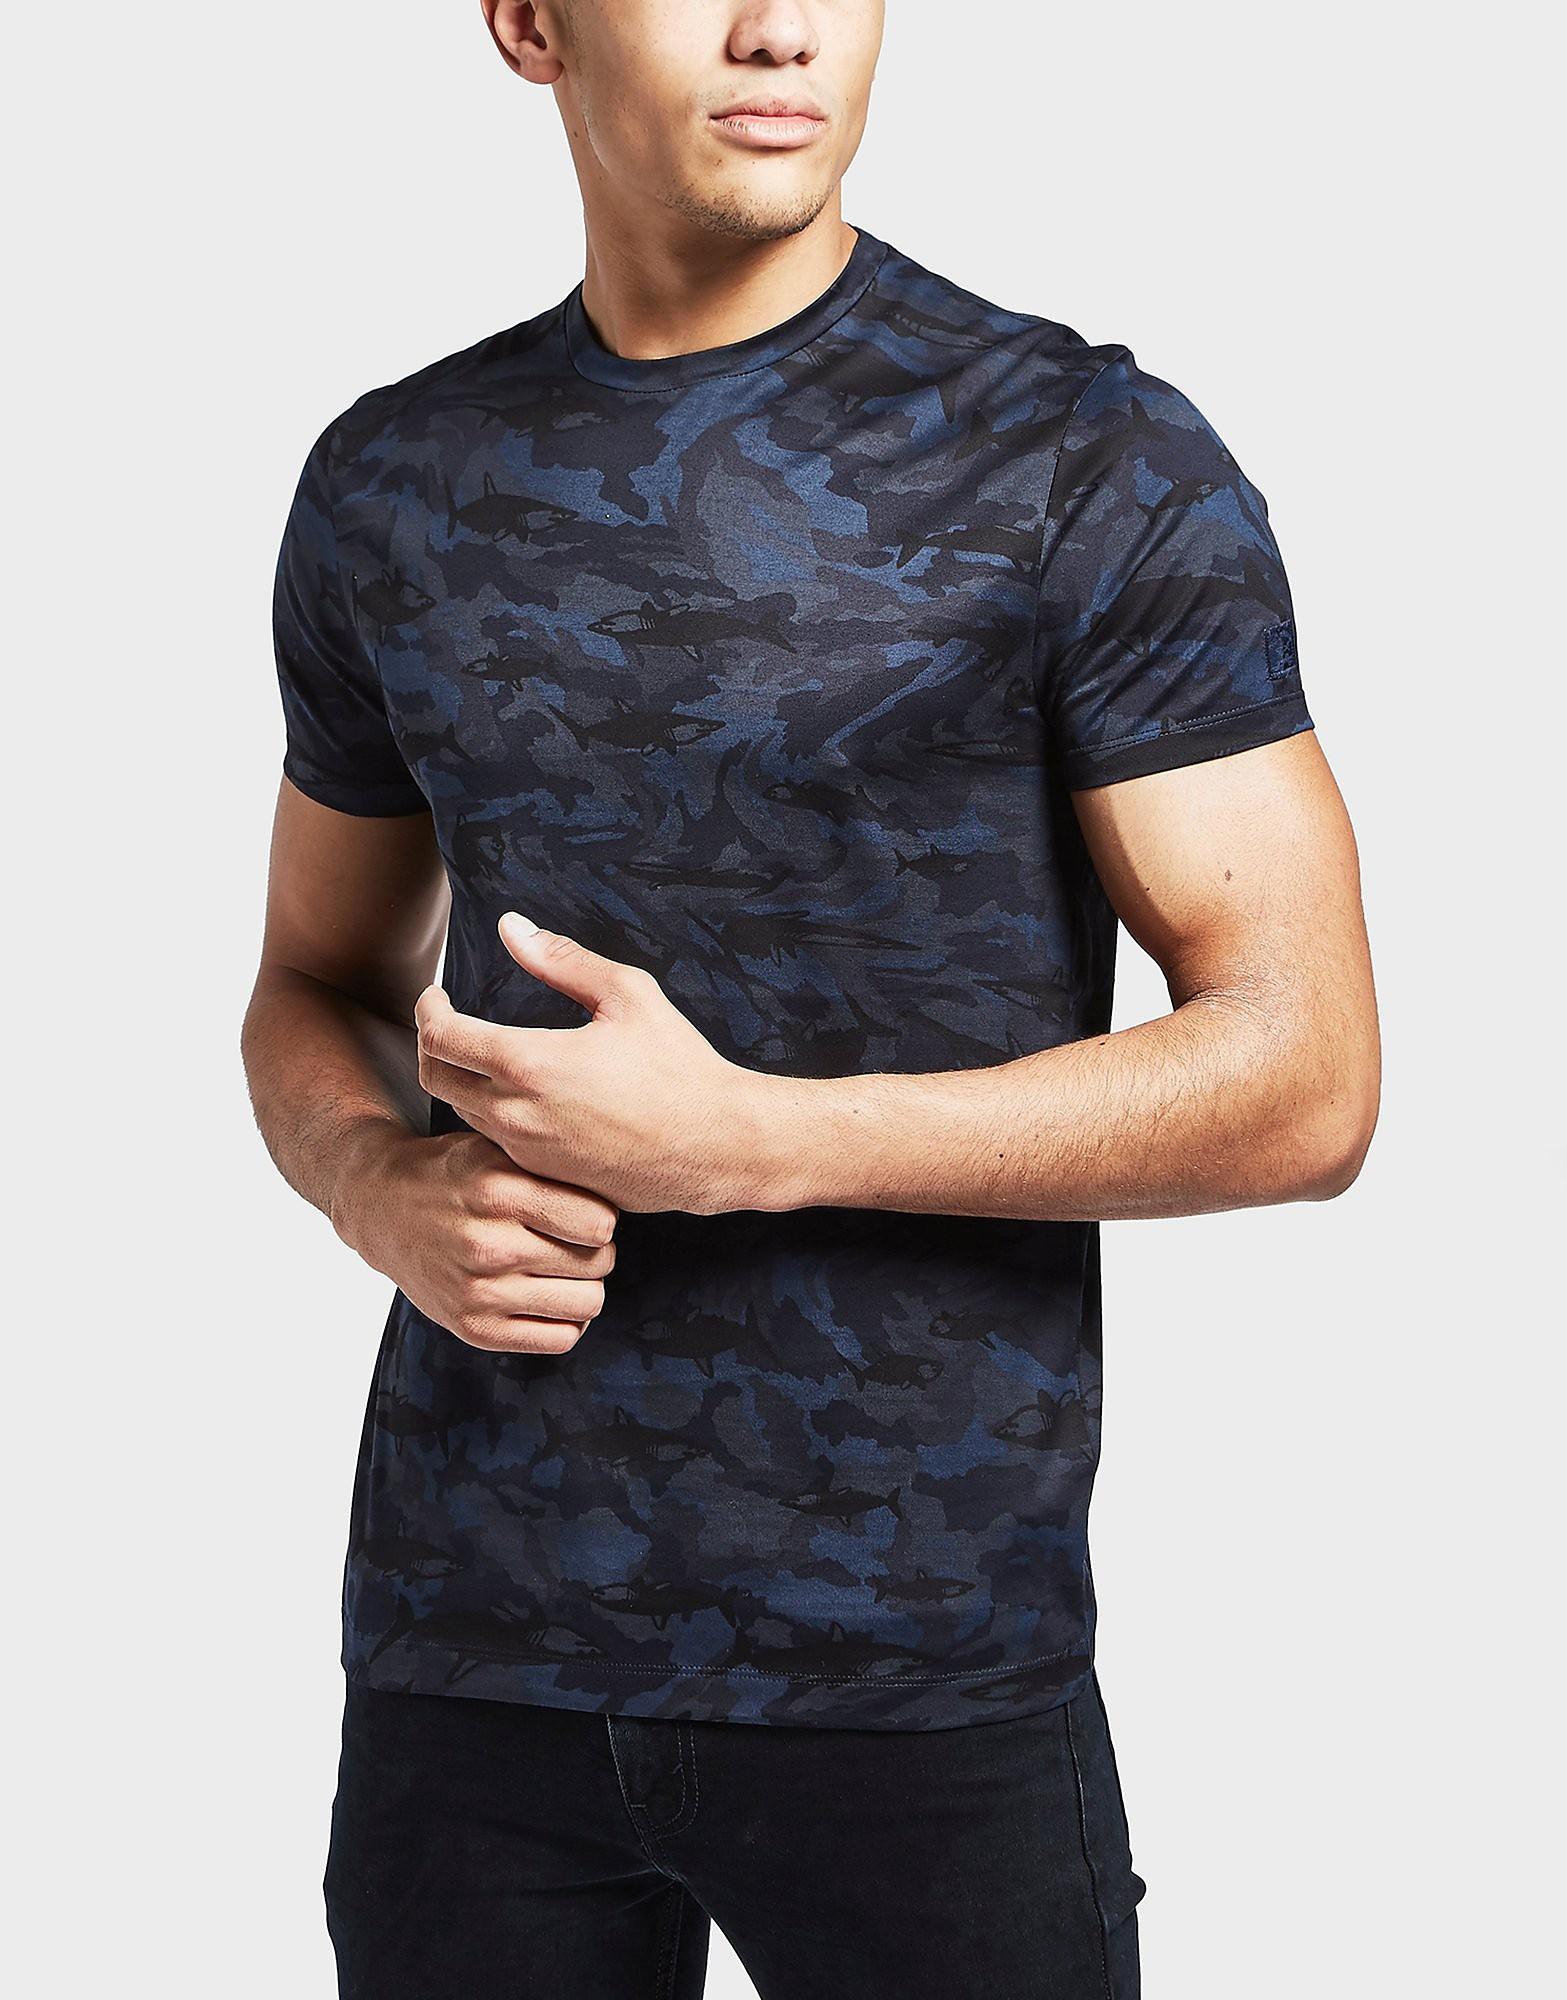 Paul and Shark Shark Camouflage Short Sleeve T-Shirt